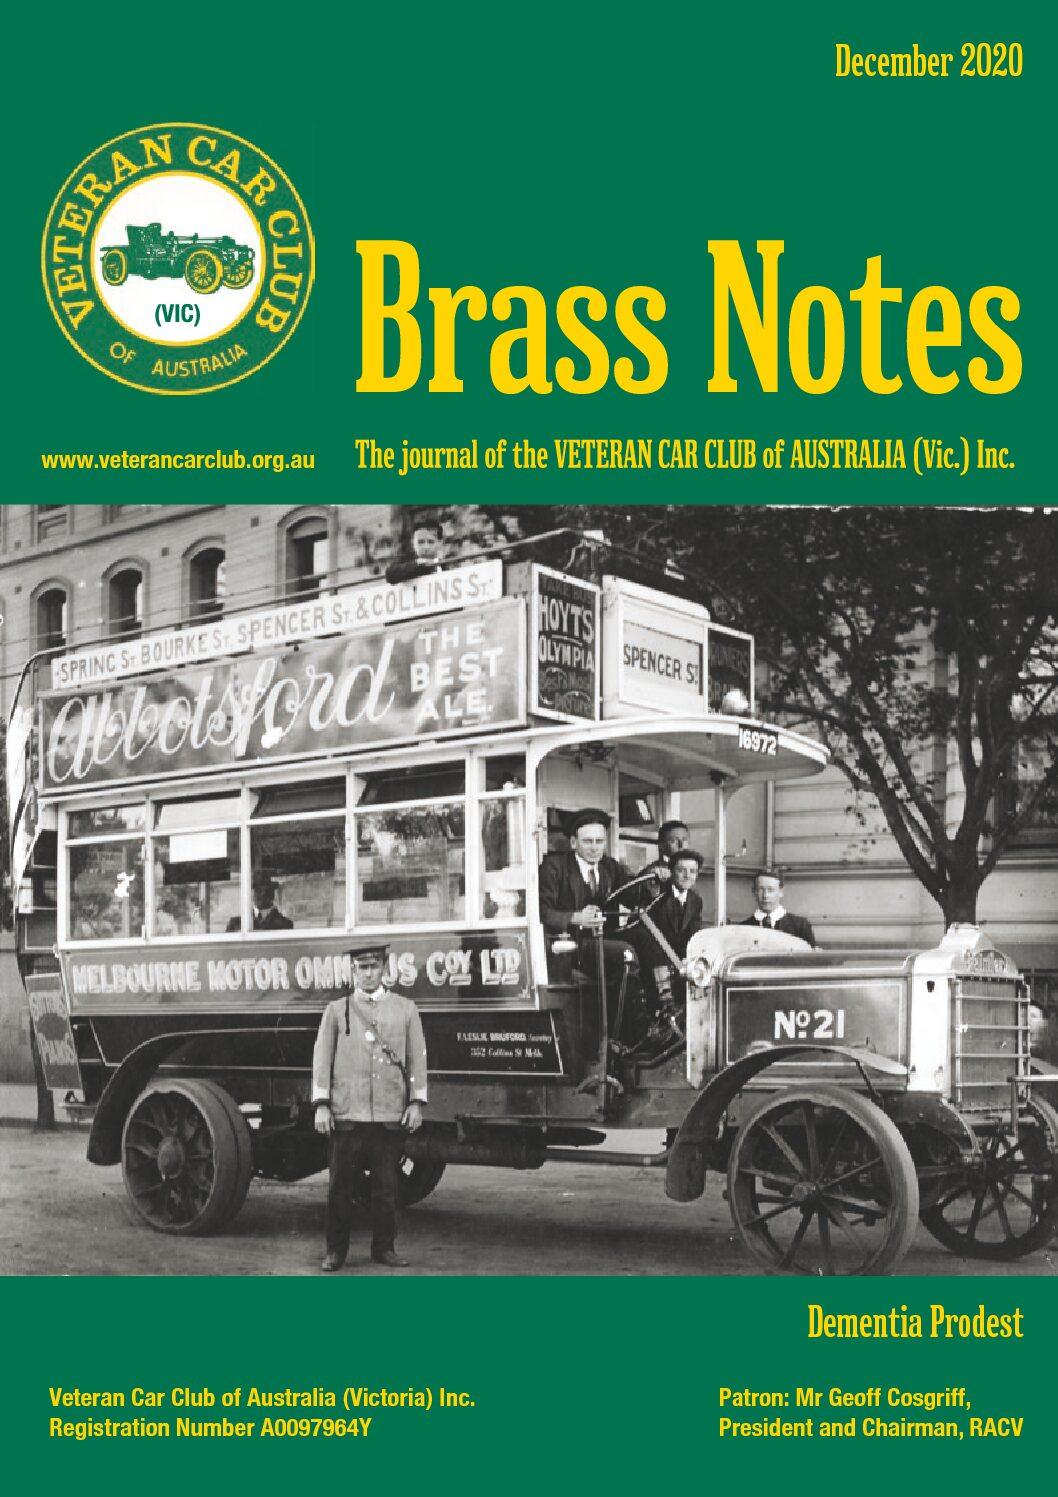 Brass Notes December 2020